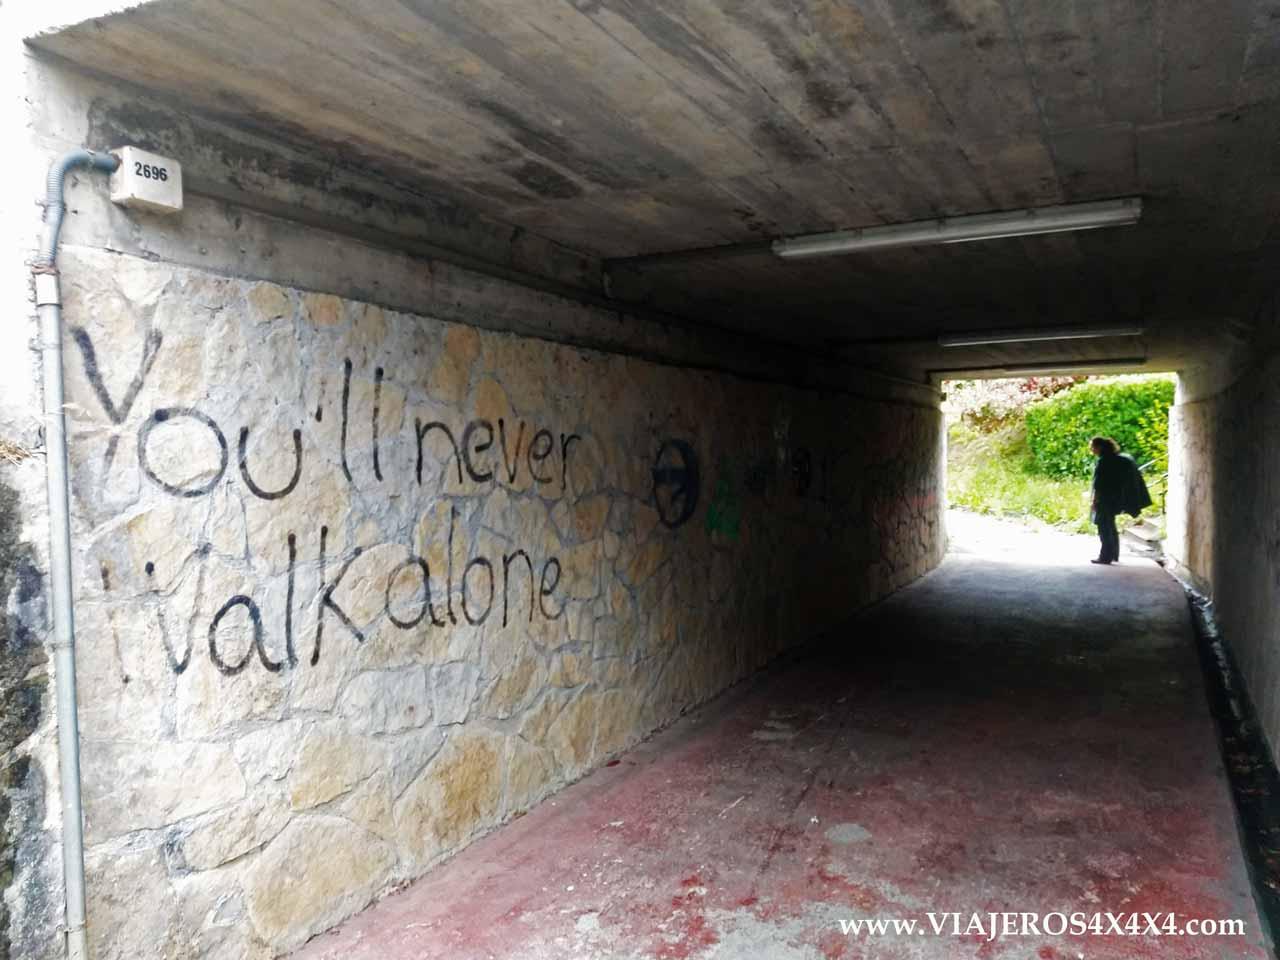 Grafiti you'll never walk alone